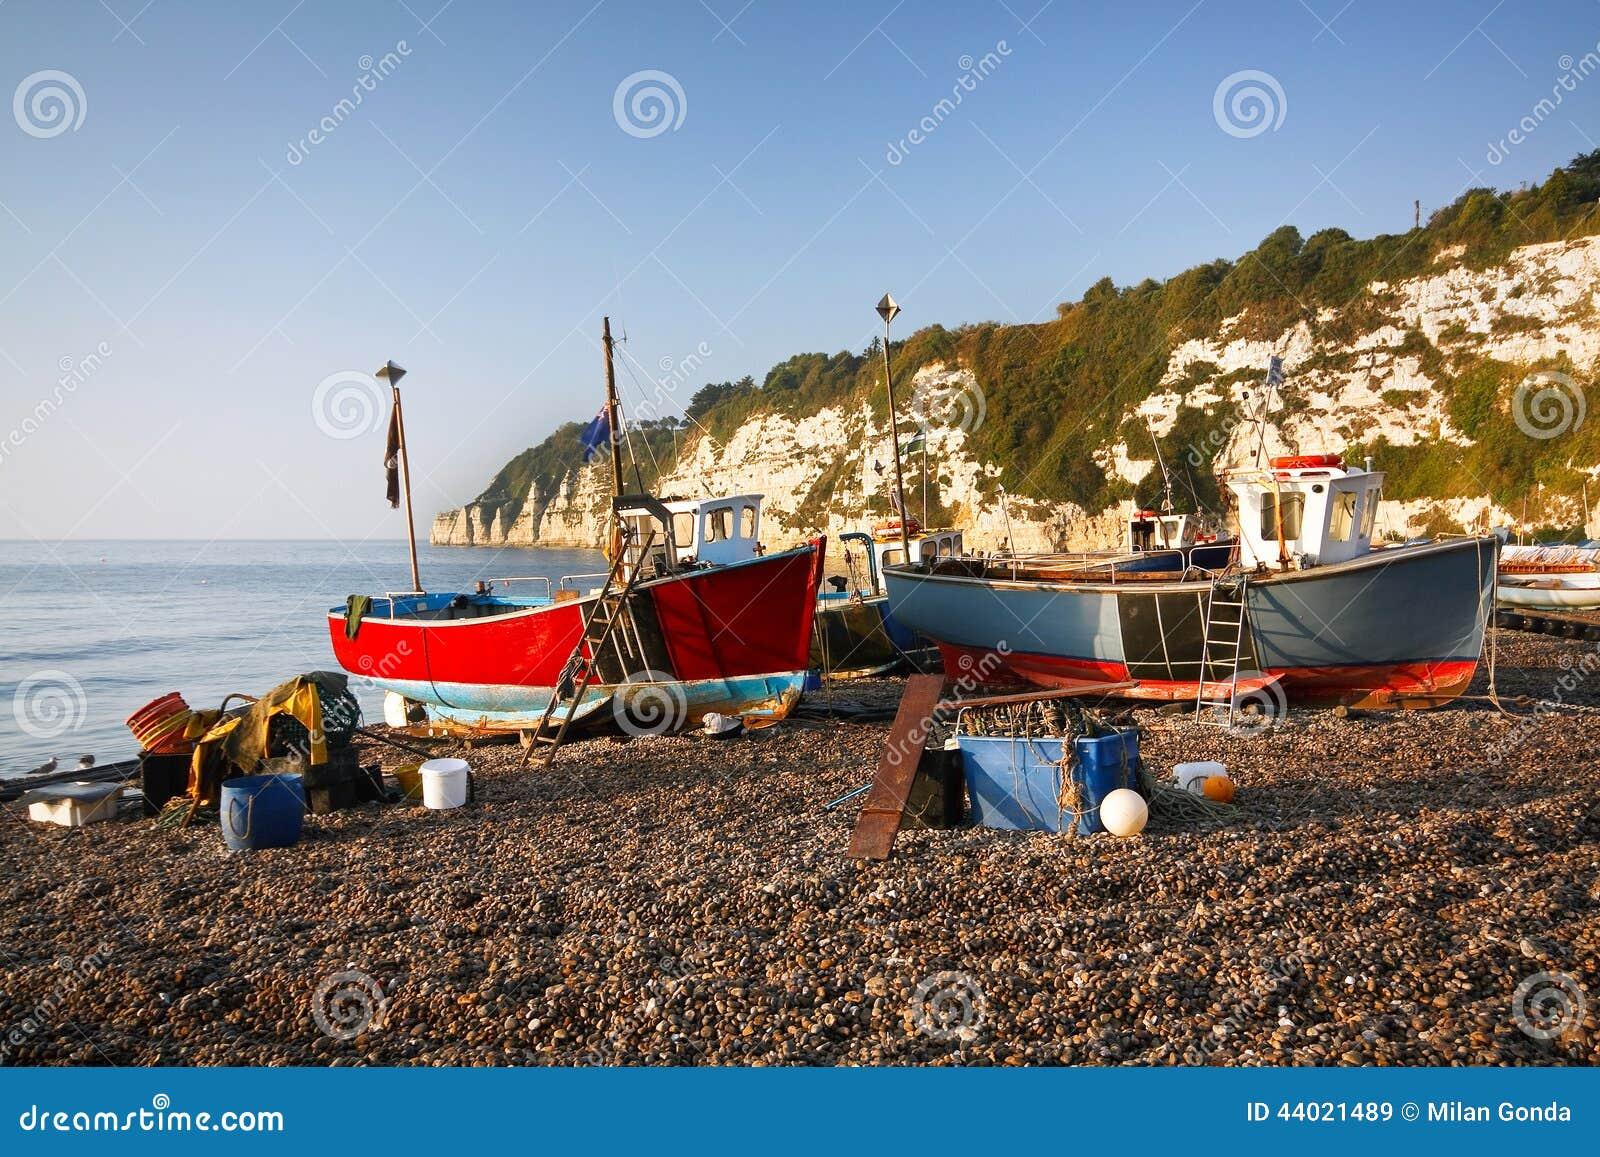 Fishing boats dorset uk stock photo image 44021489 for Fishing spots near me no boat